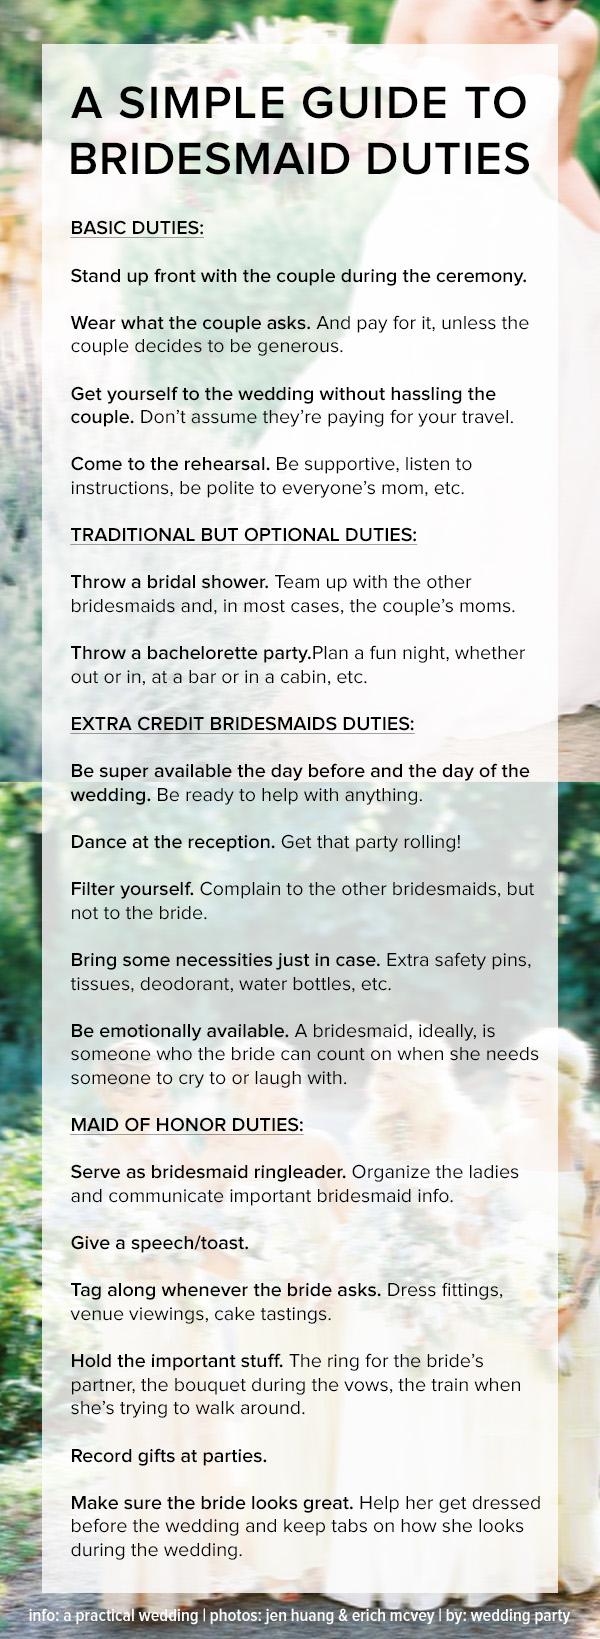 guide to bridesmaids duties etiquette infographic